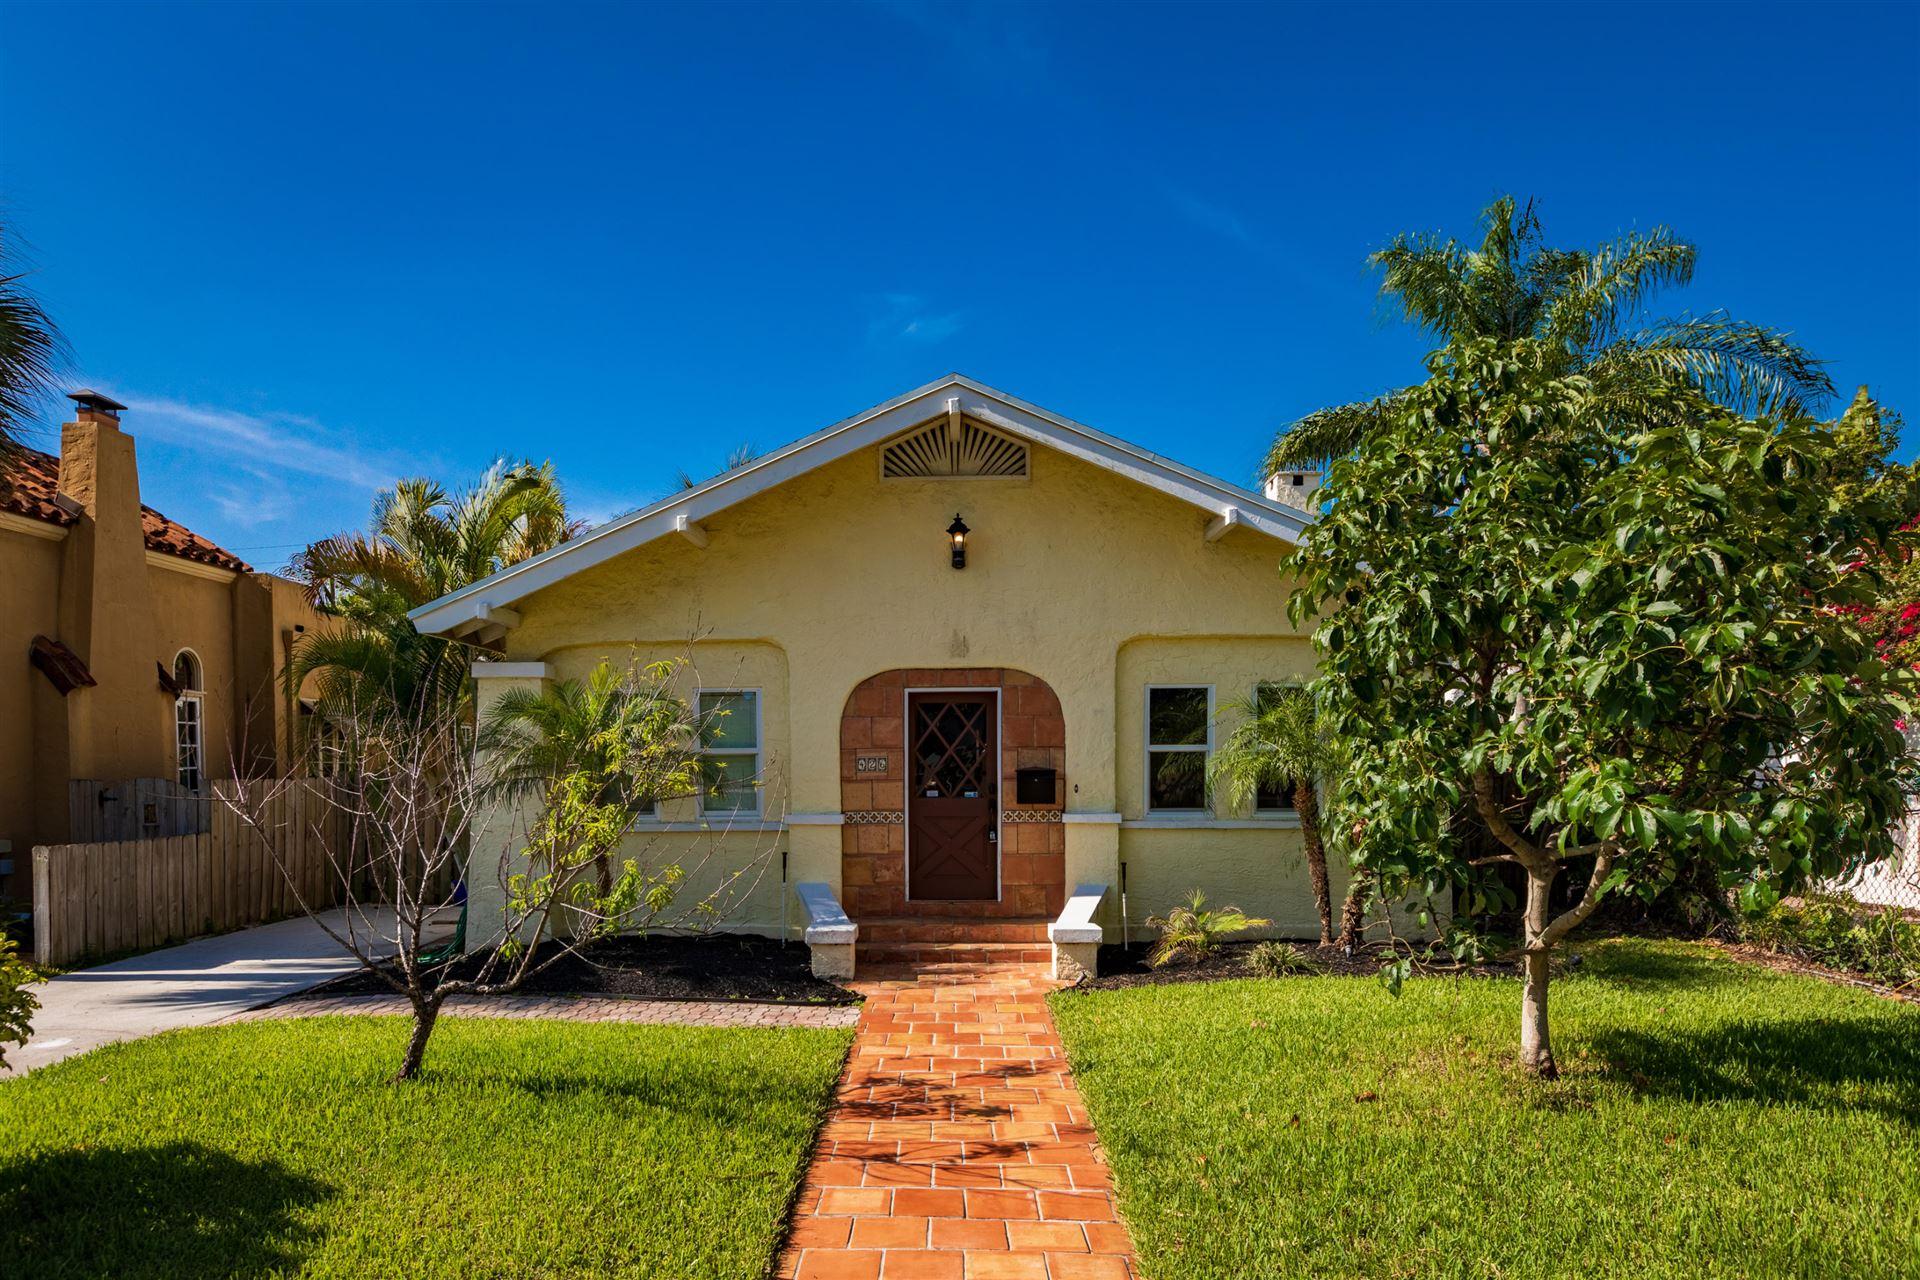 426 30th Street, West Palm Beach, FL 33407 - #: RX-10621505